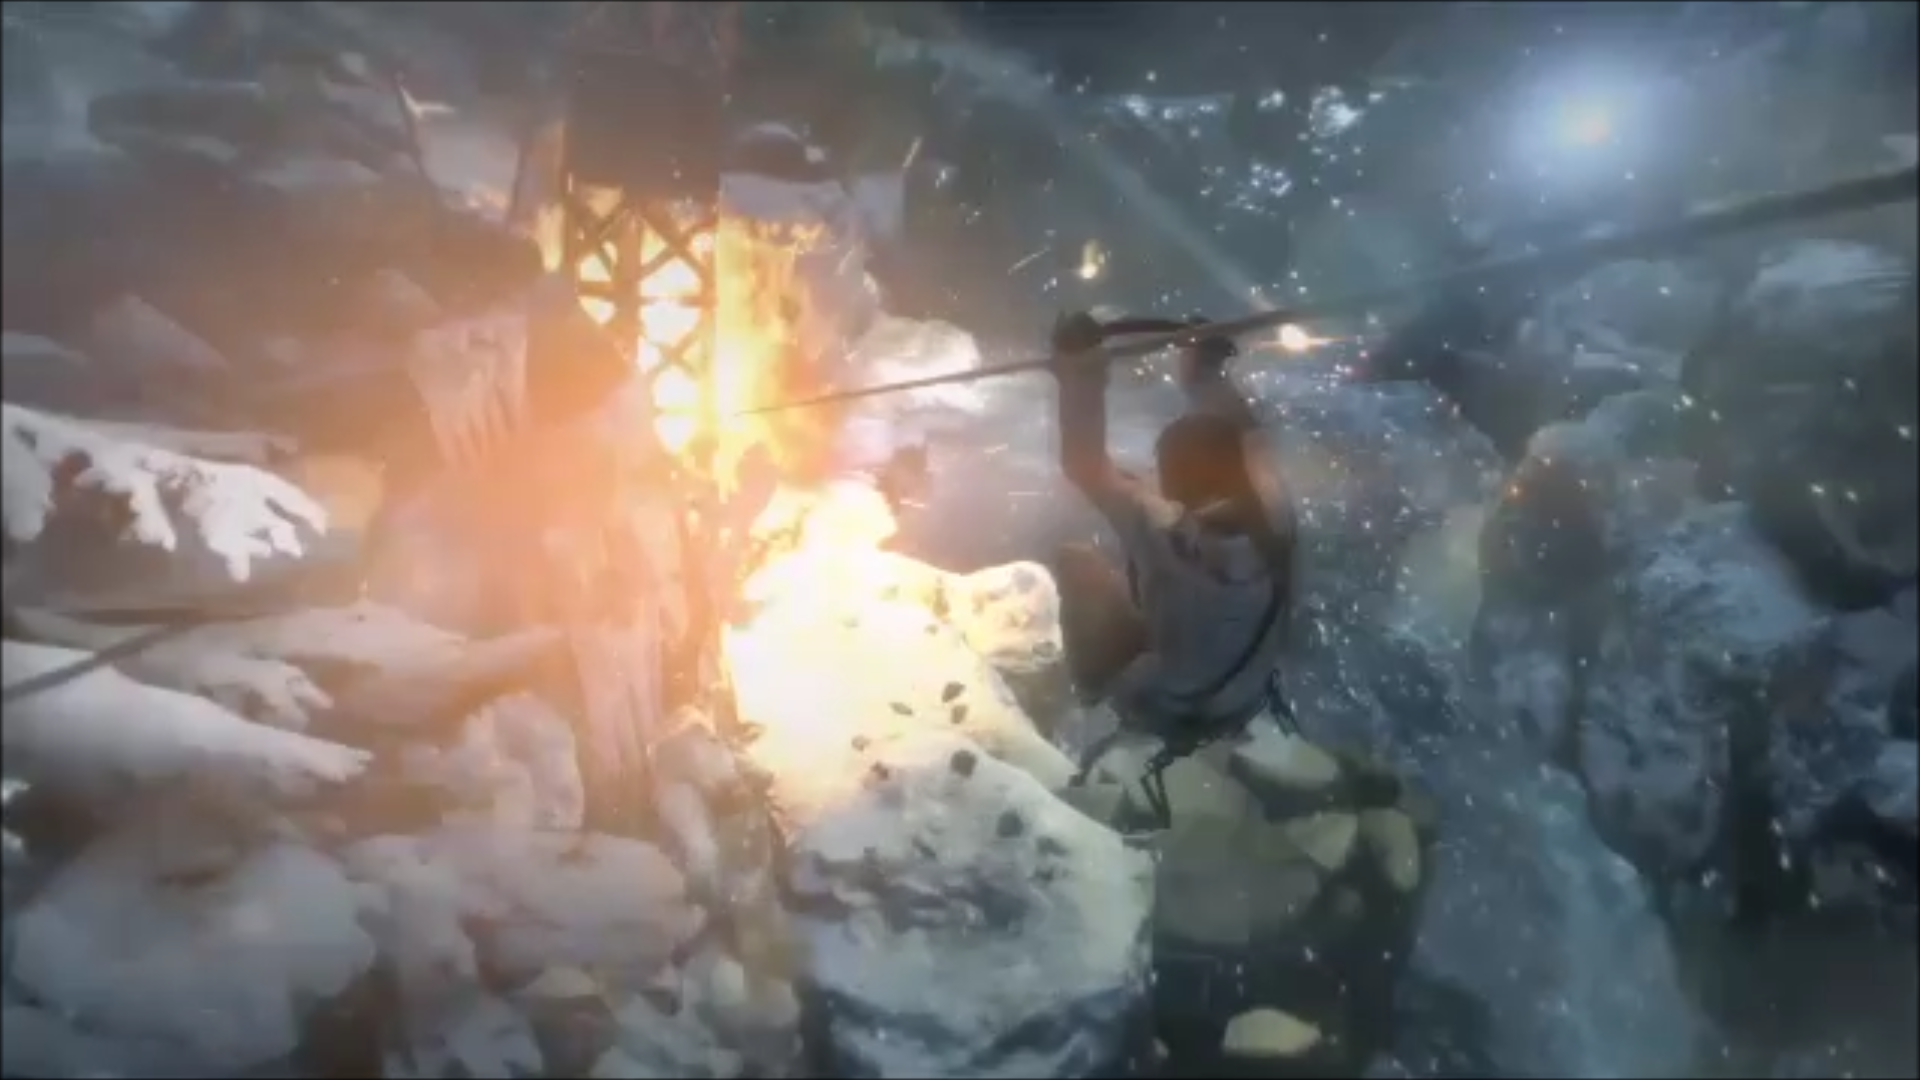 Lara Croft sur une tyrolienne